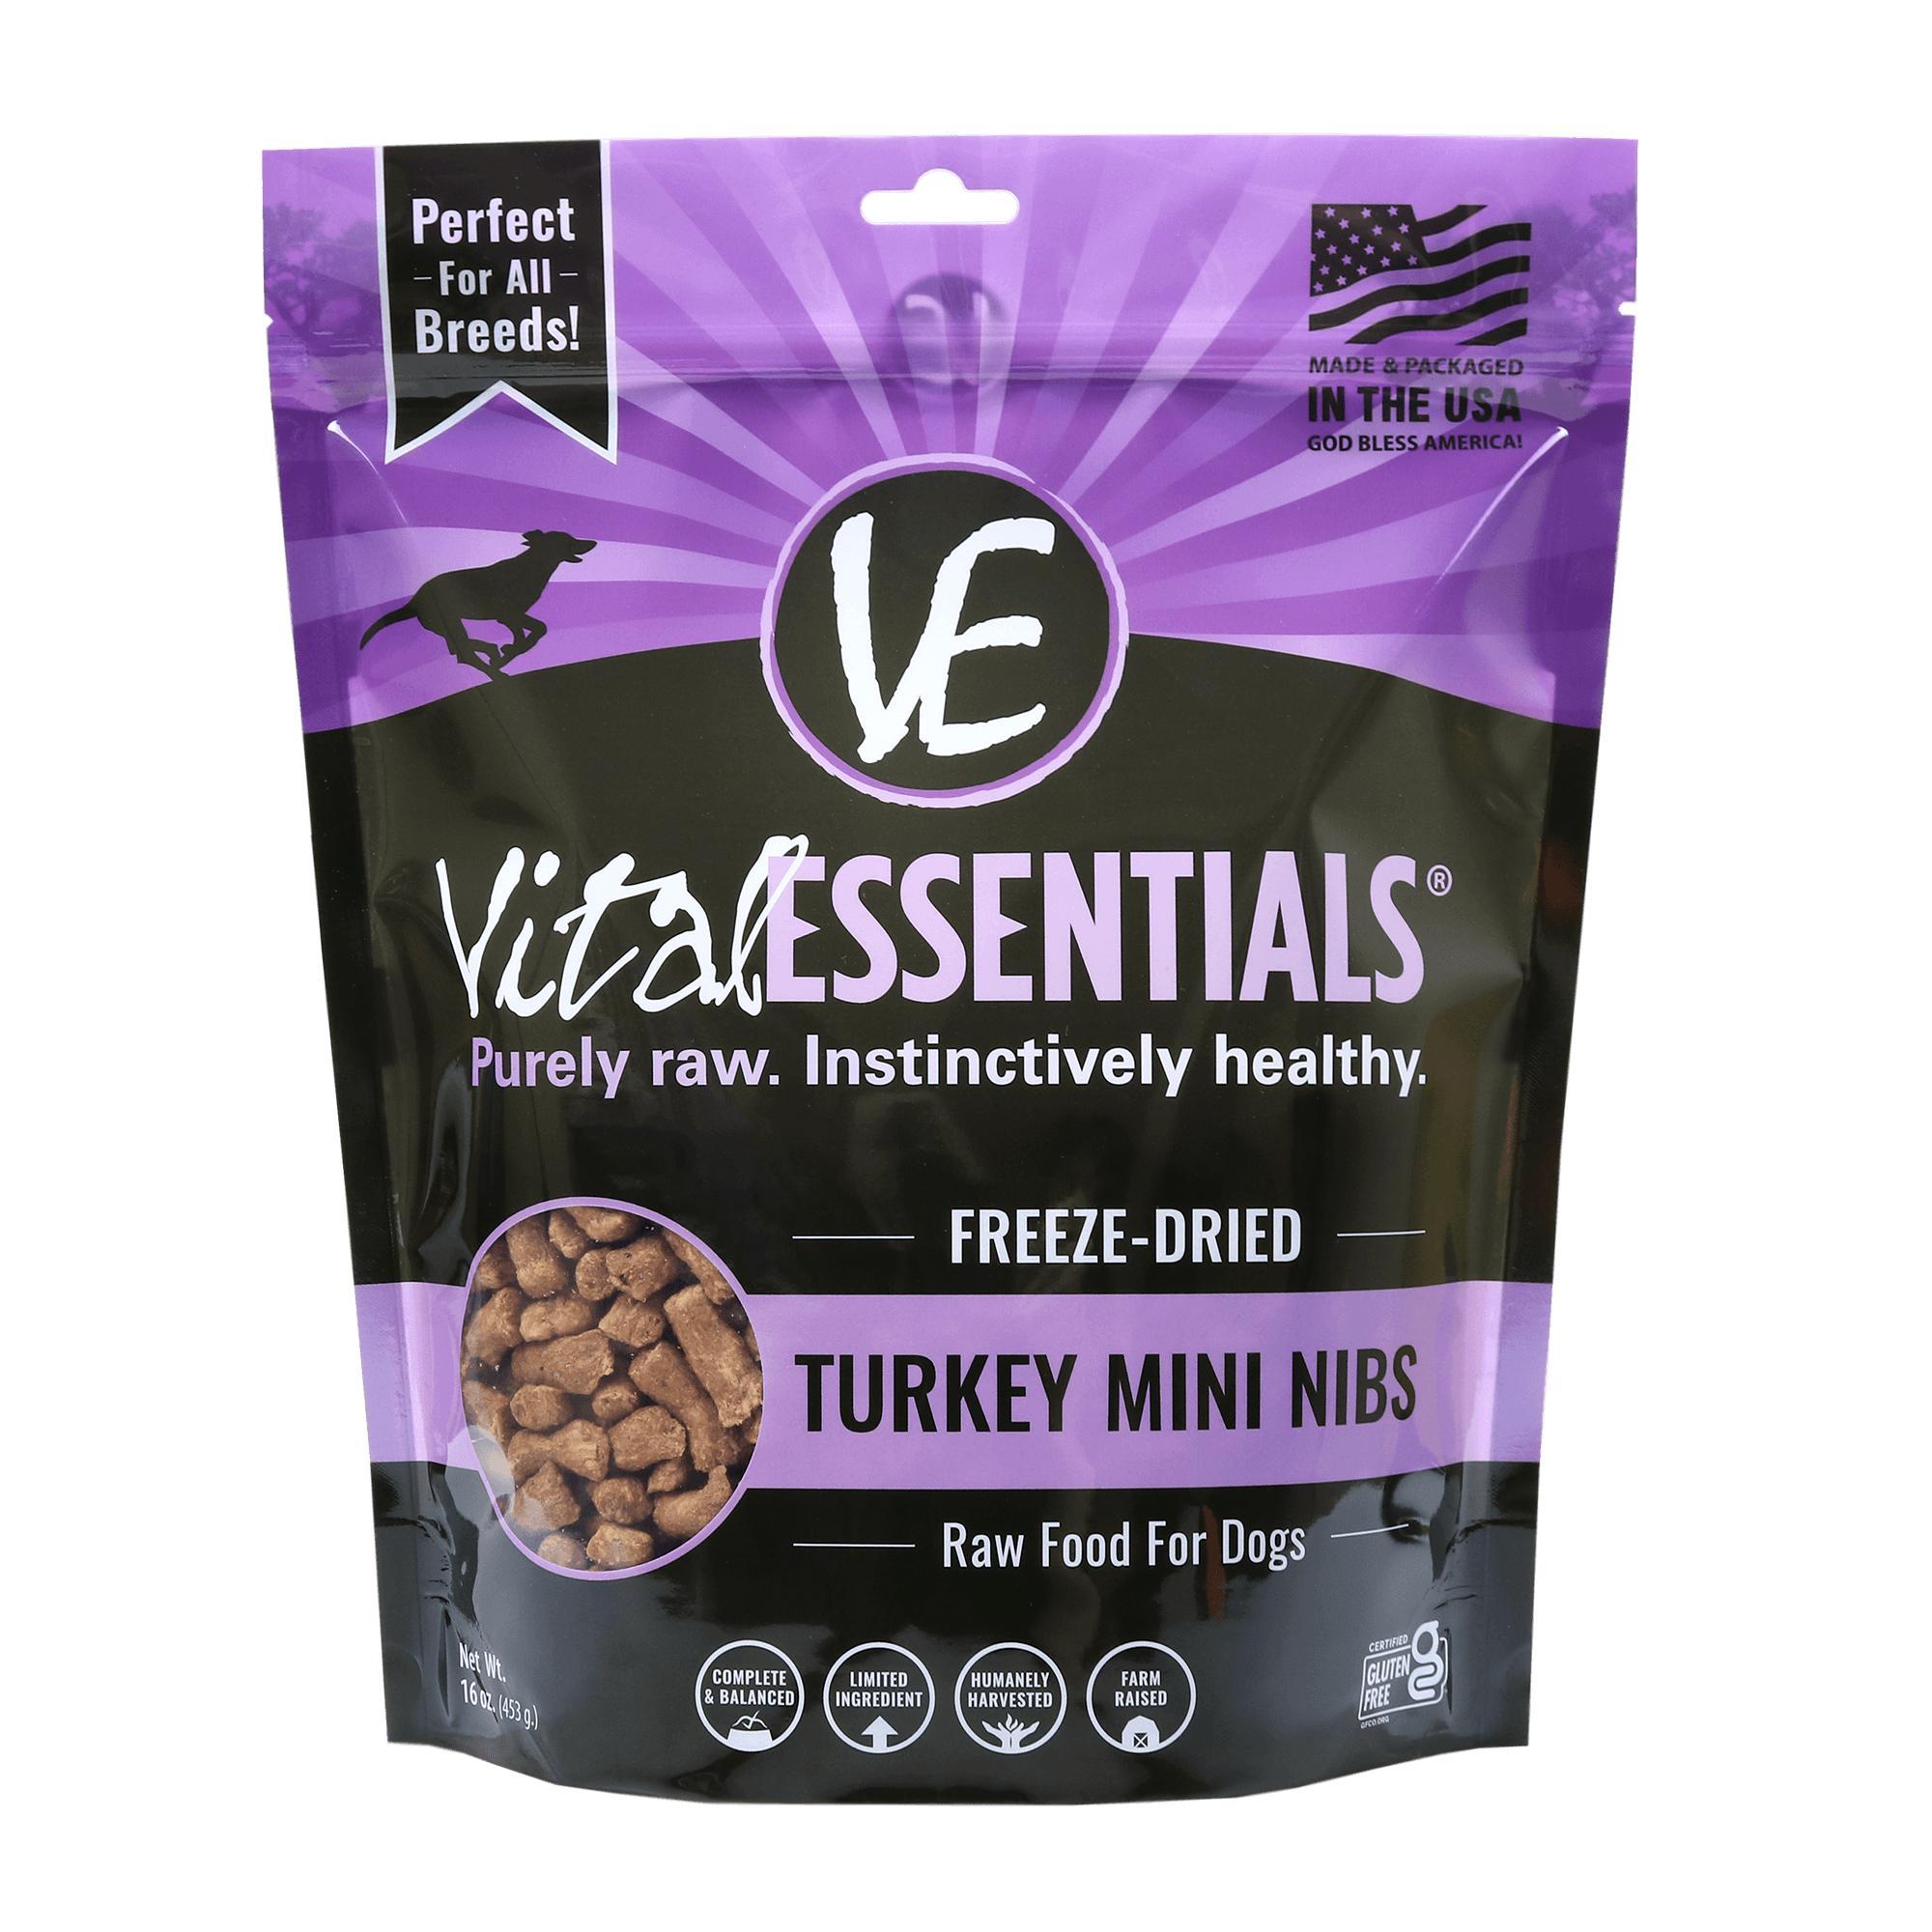 Vital Essentials Turkey Entree Mini Nibs Grain-Free Freeze-Dried Dog Food Image